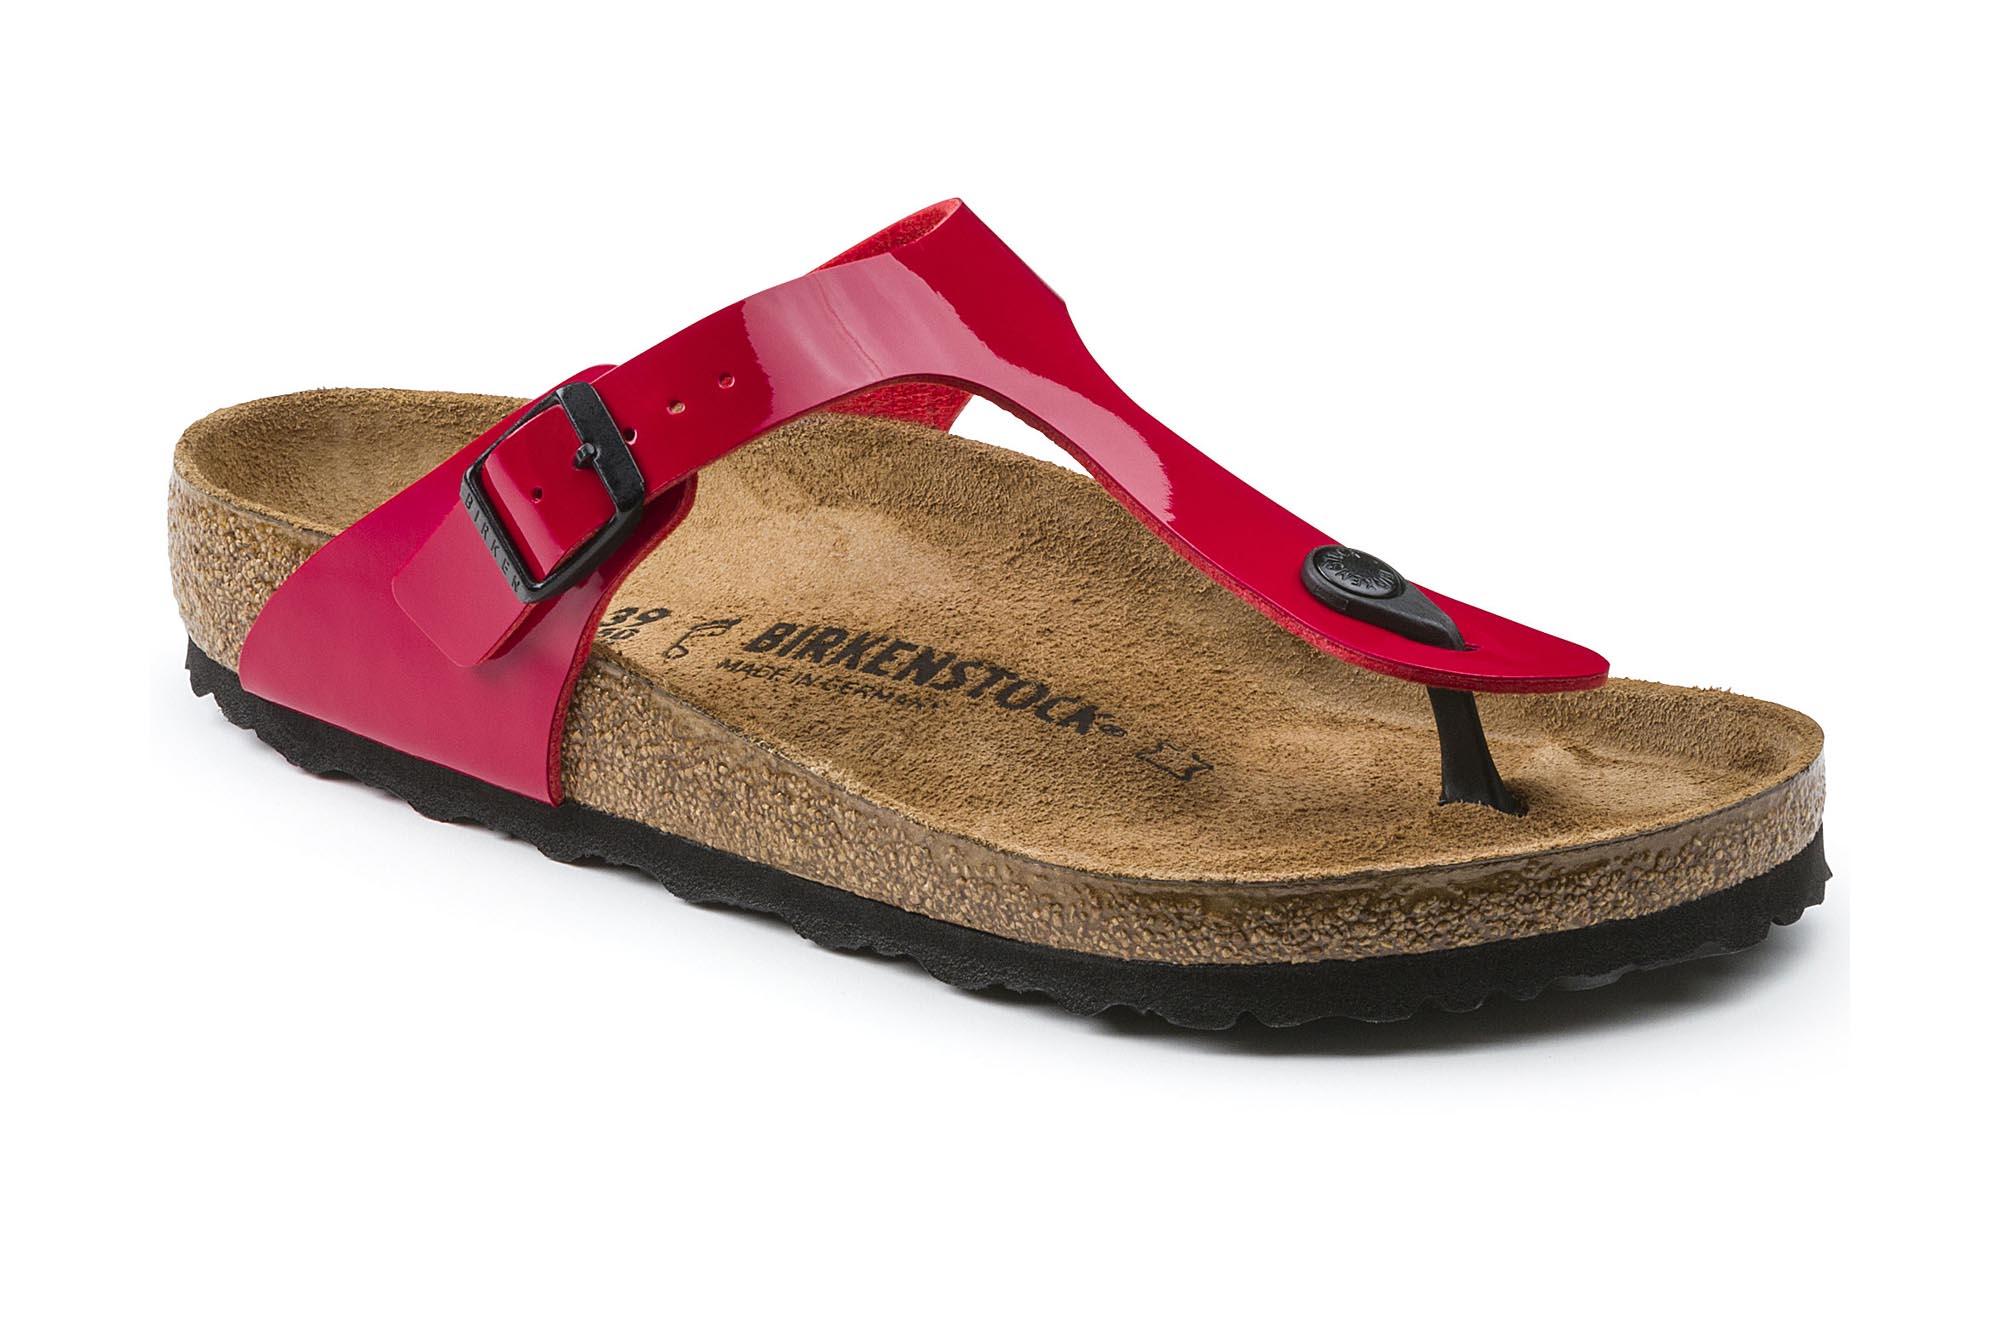 bd458f090e2 birkenstock arizona soft leather-black sandals birkenstocks for women